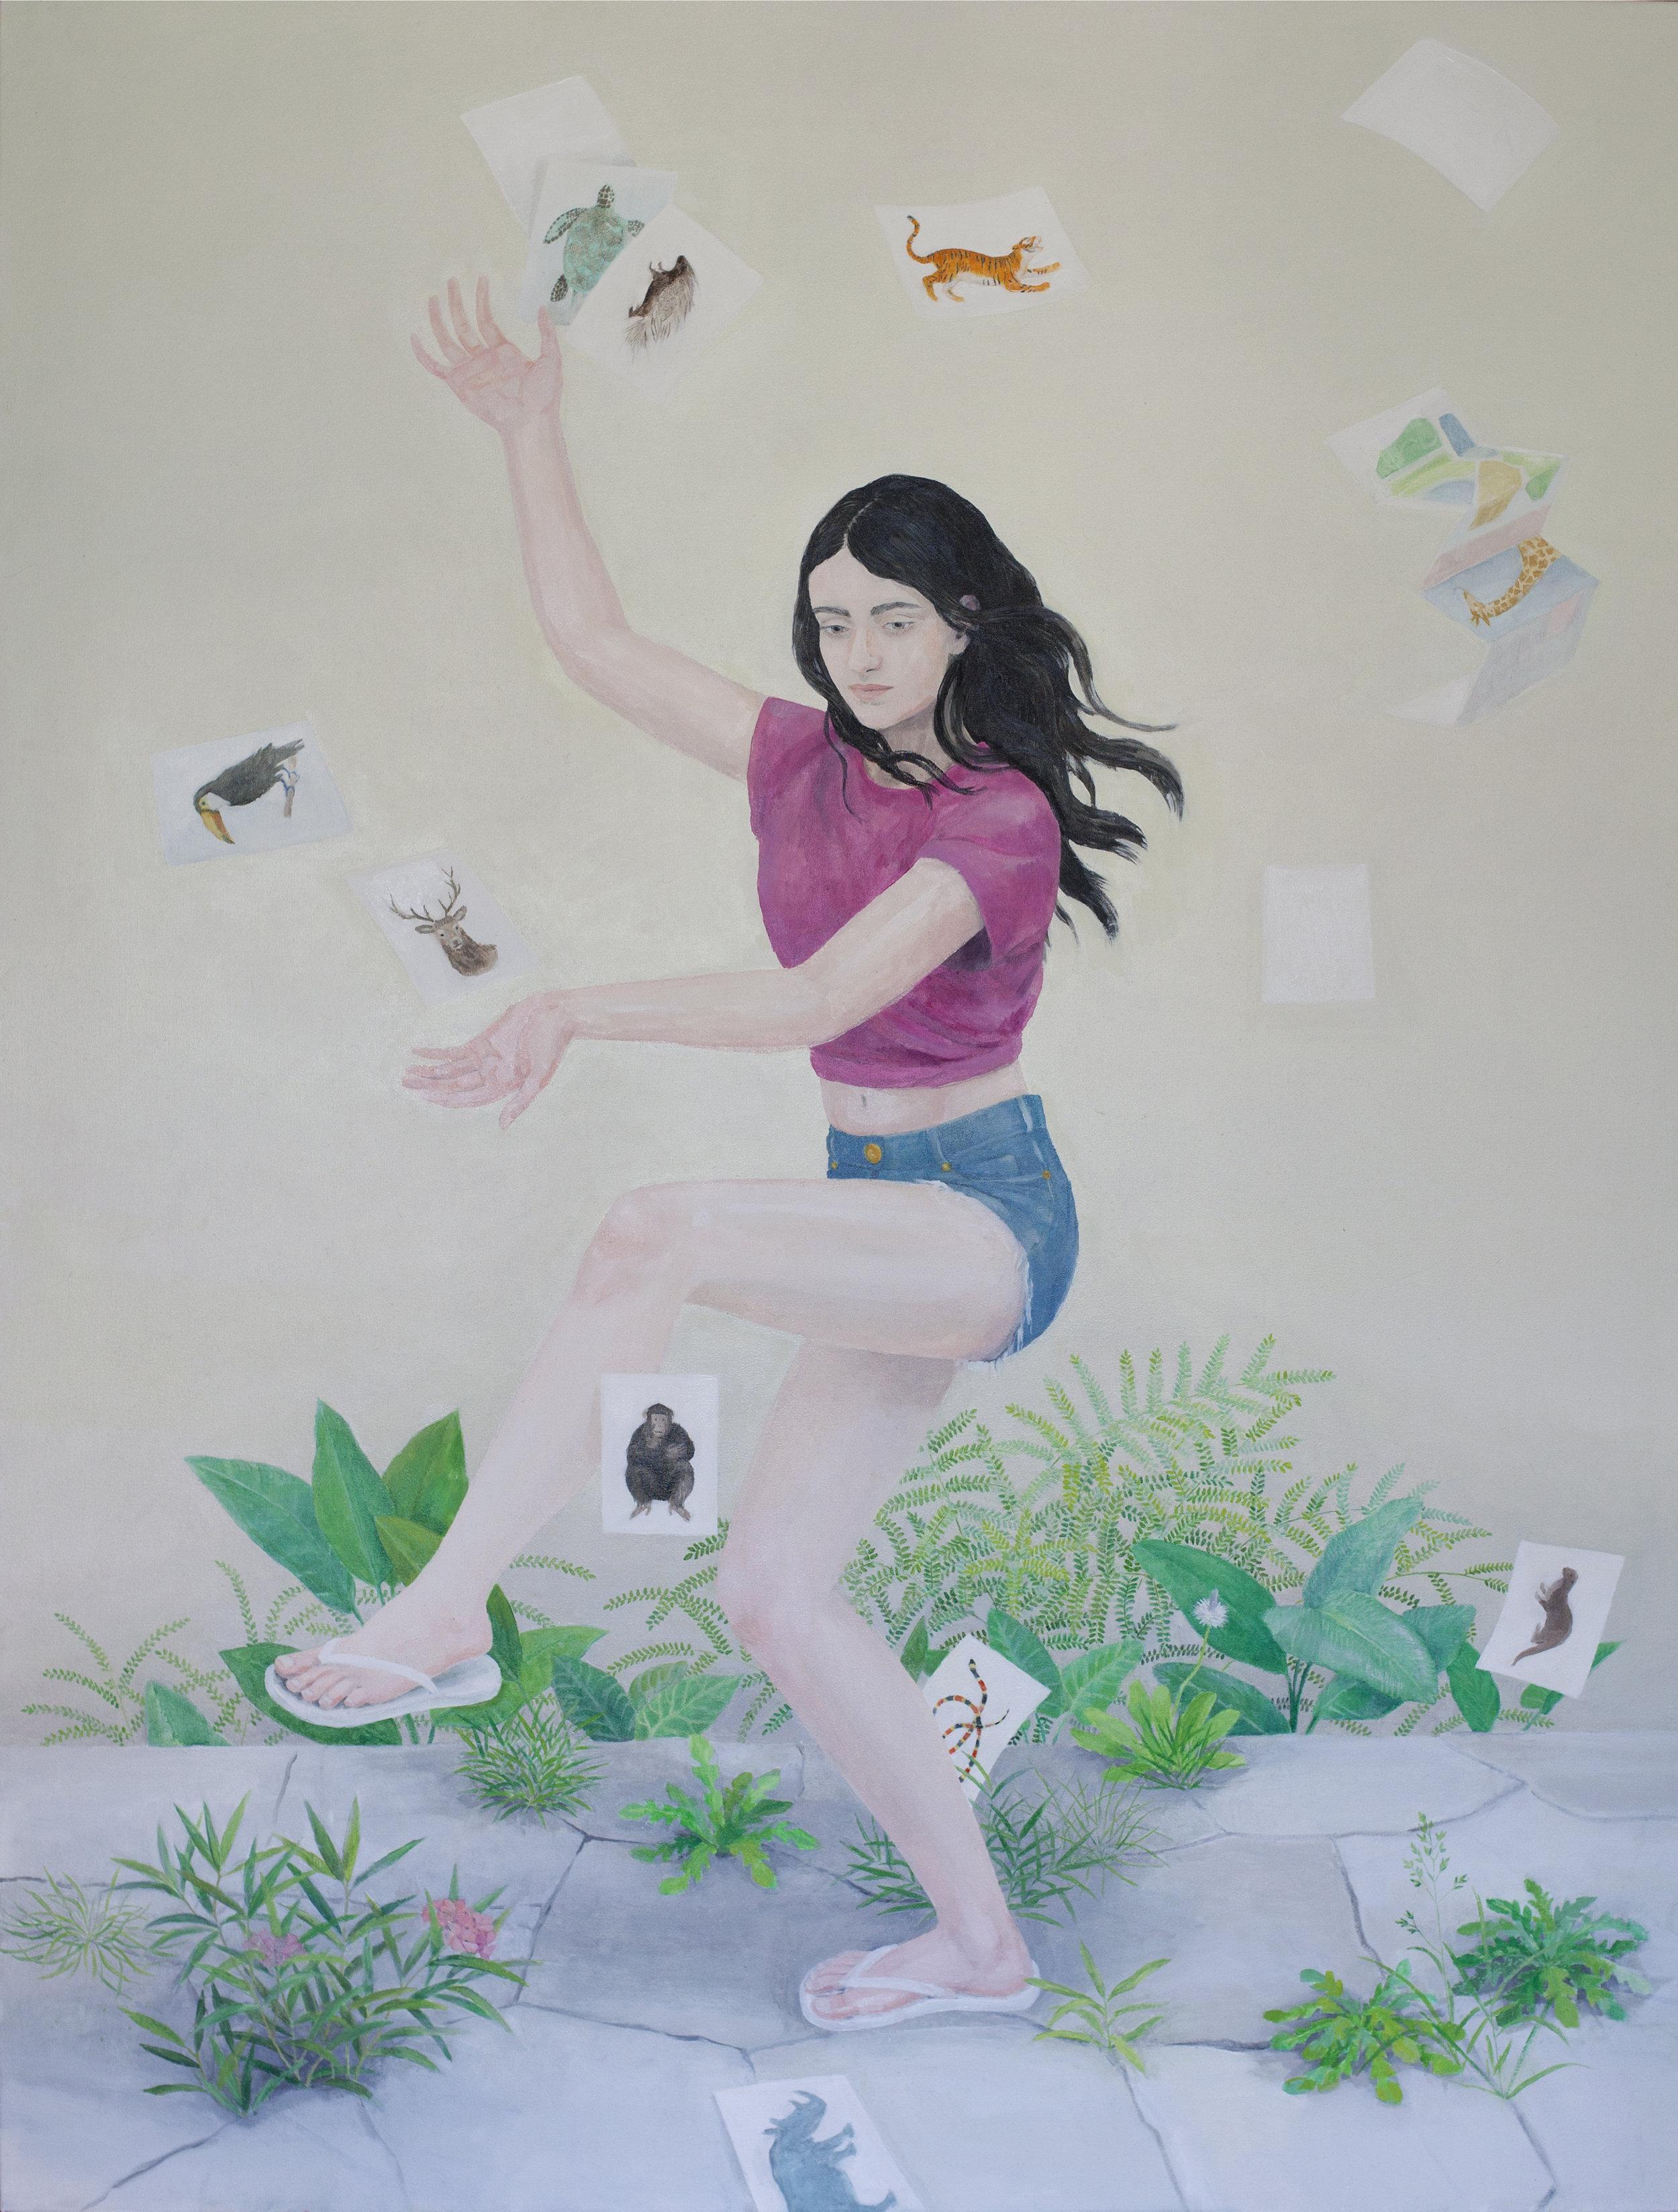 170x130cm, Oil on Canvas